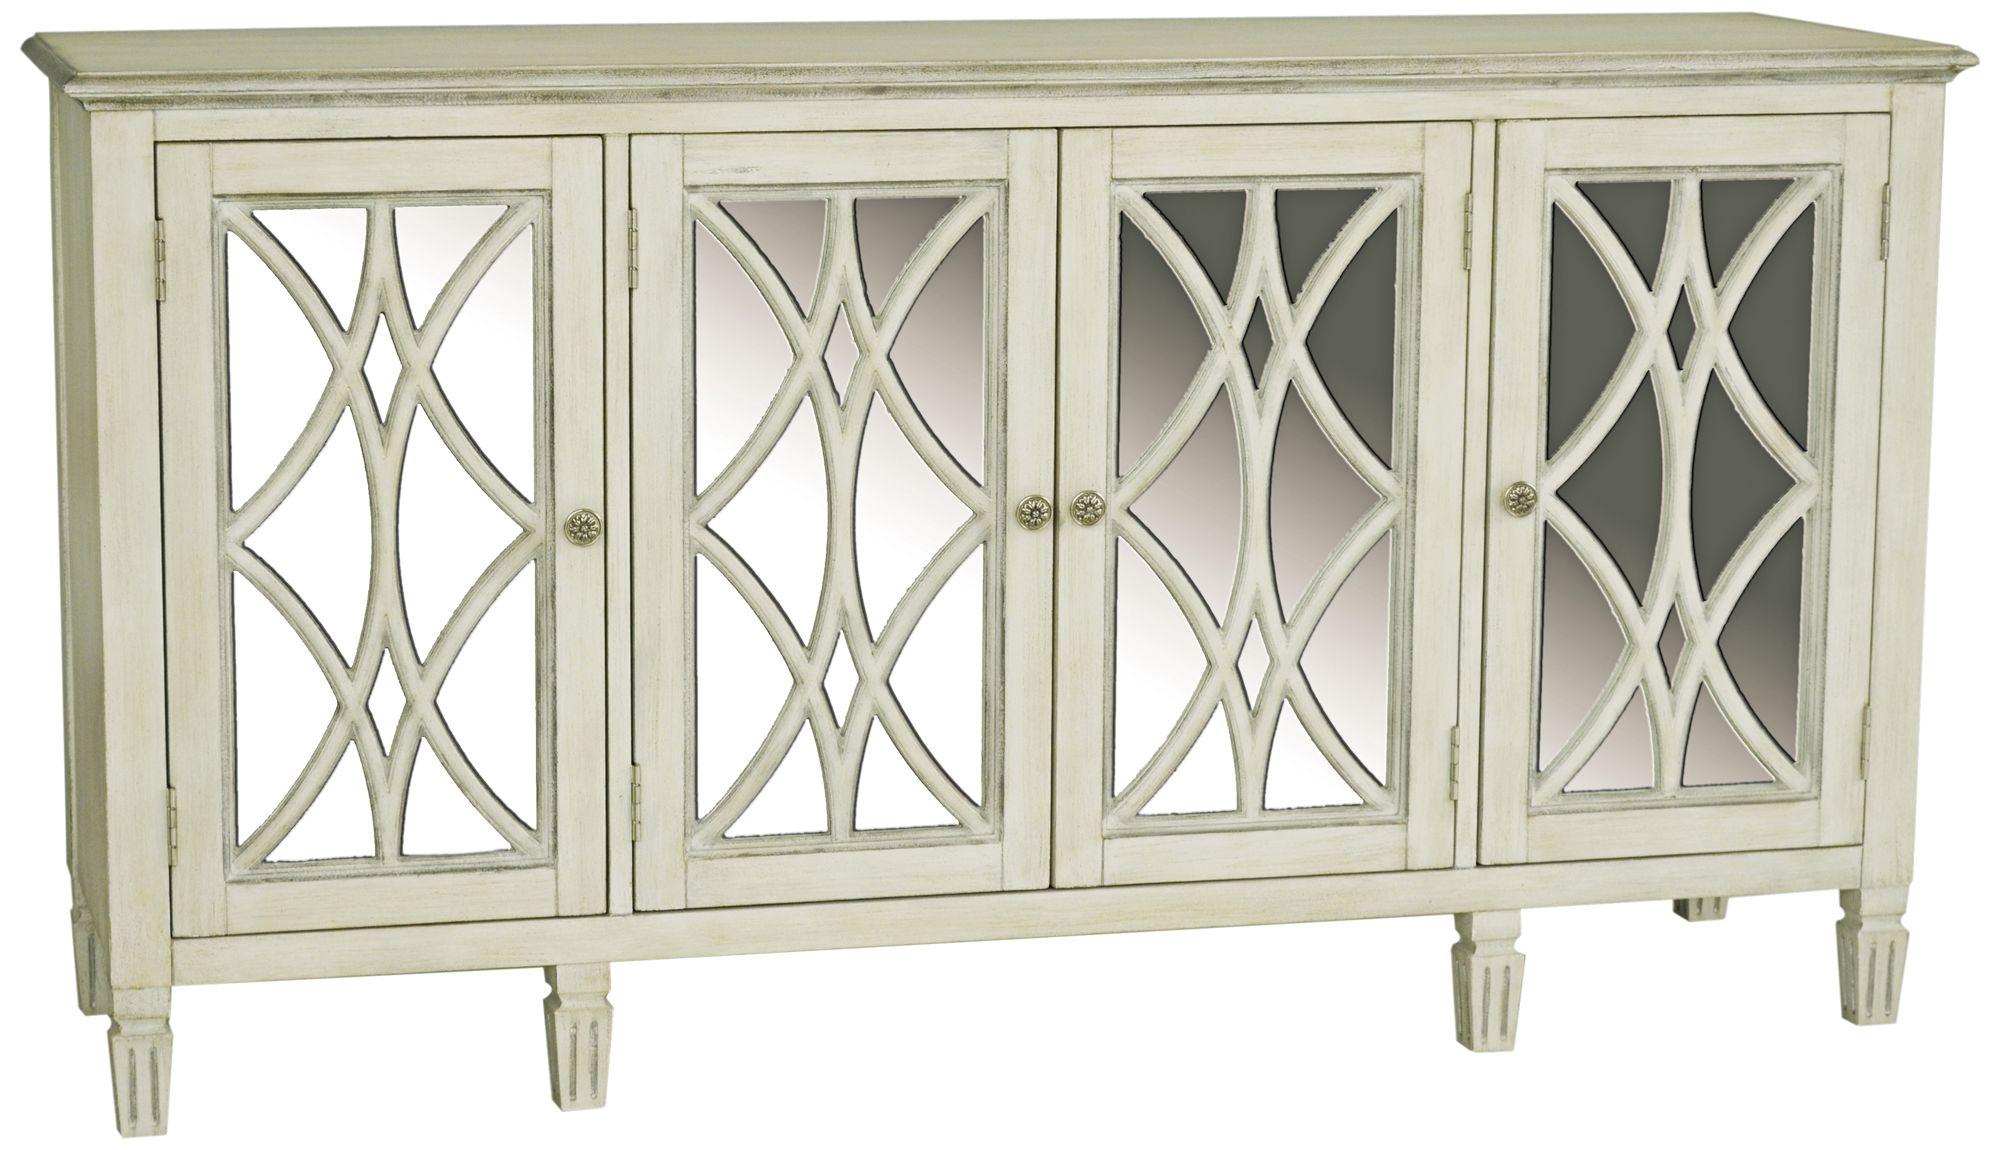 Pulaski Emila Florence White Mirror 4 Door Server Table